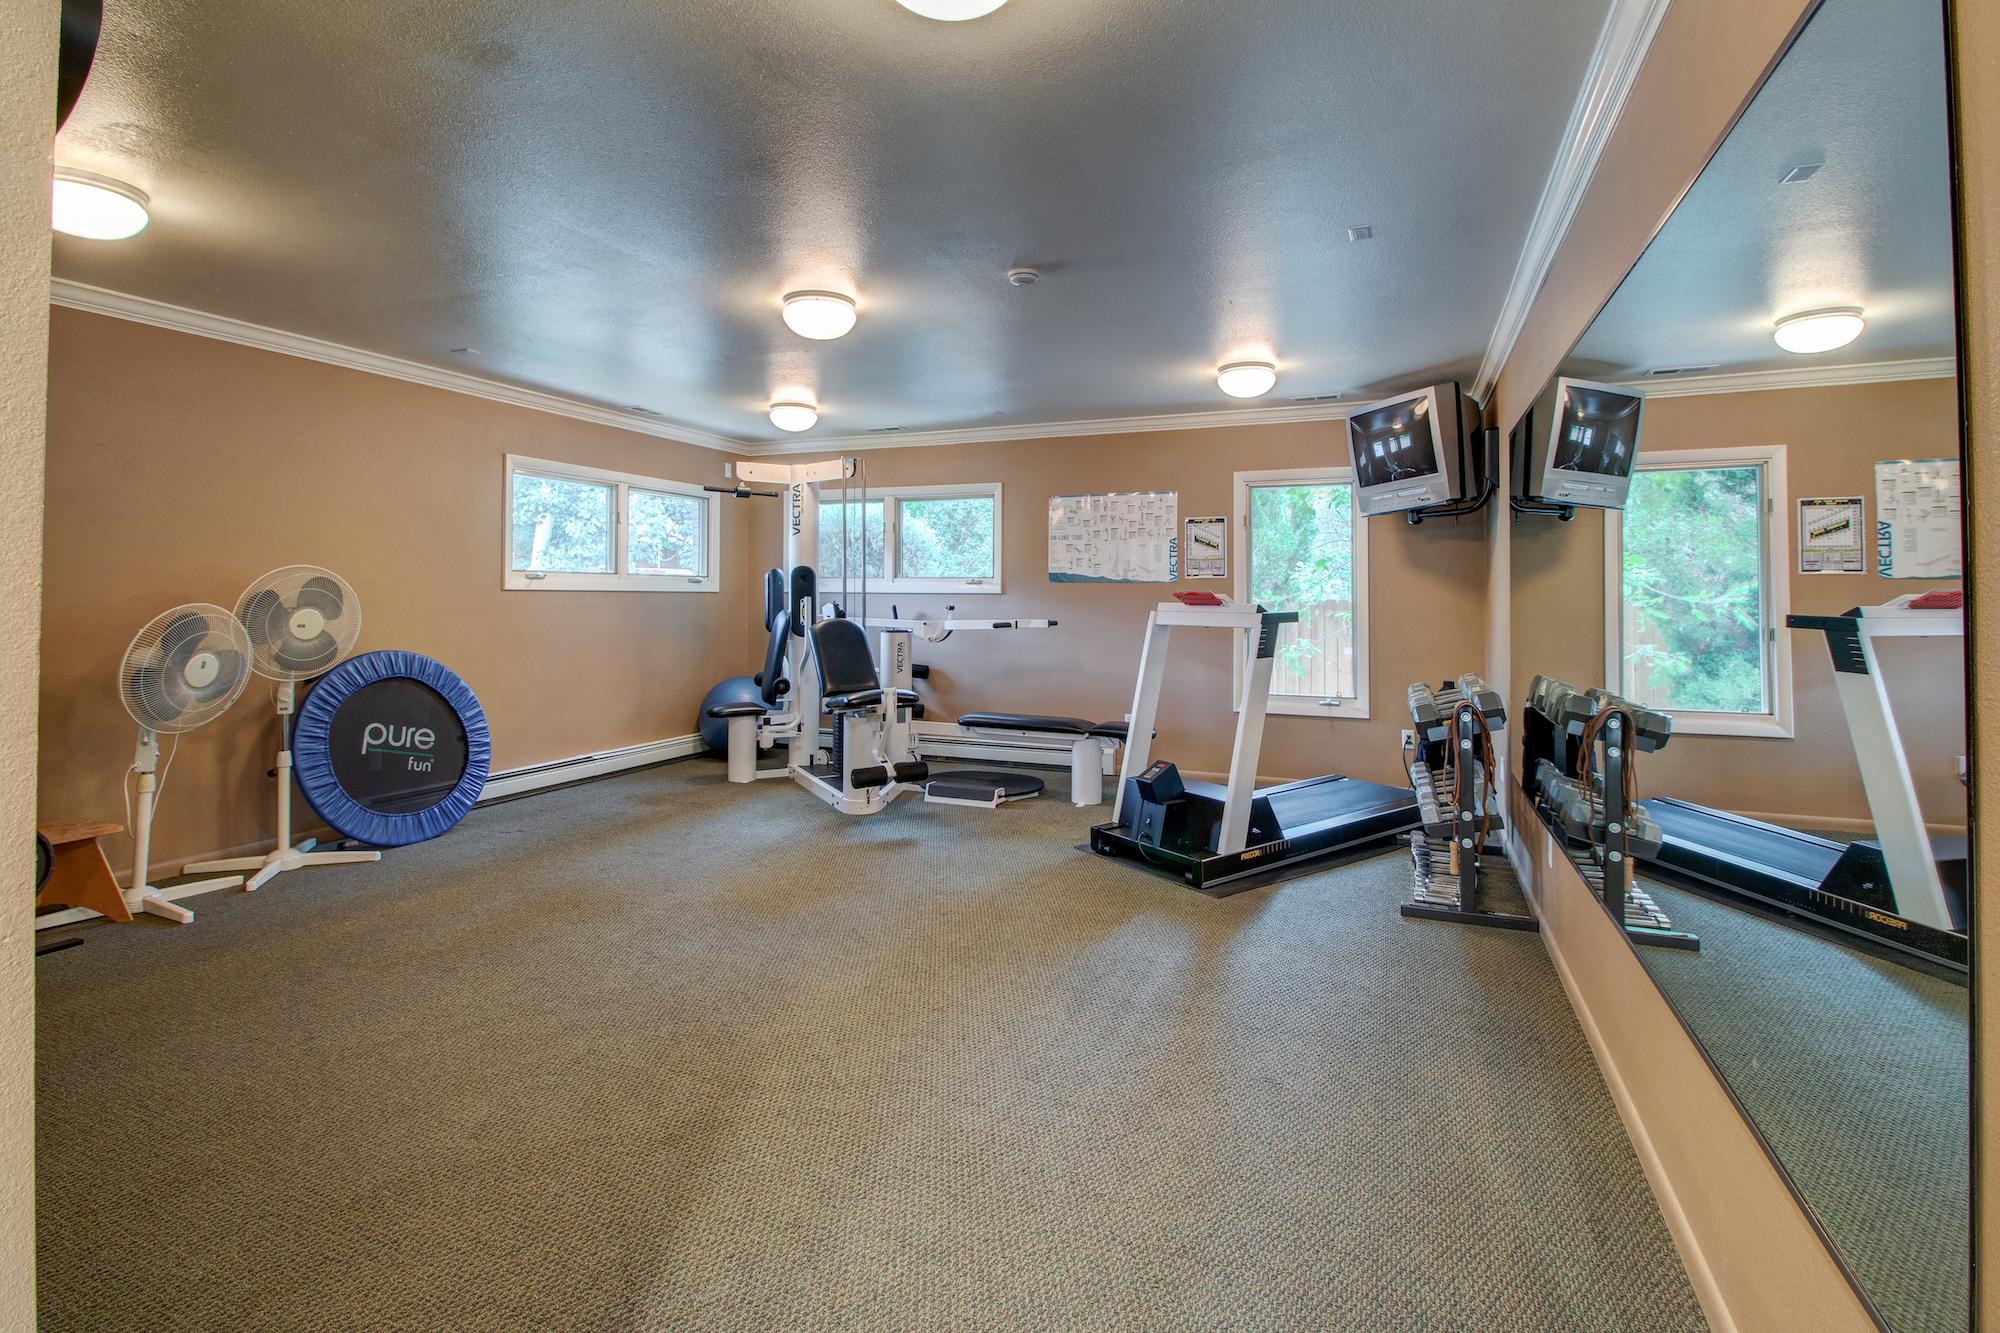 15-Exercise room on the main level.jpg